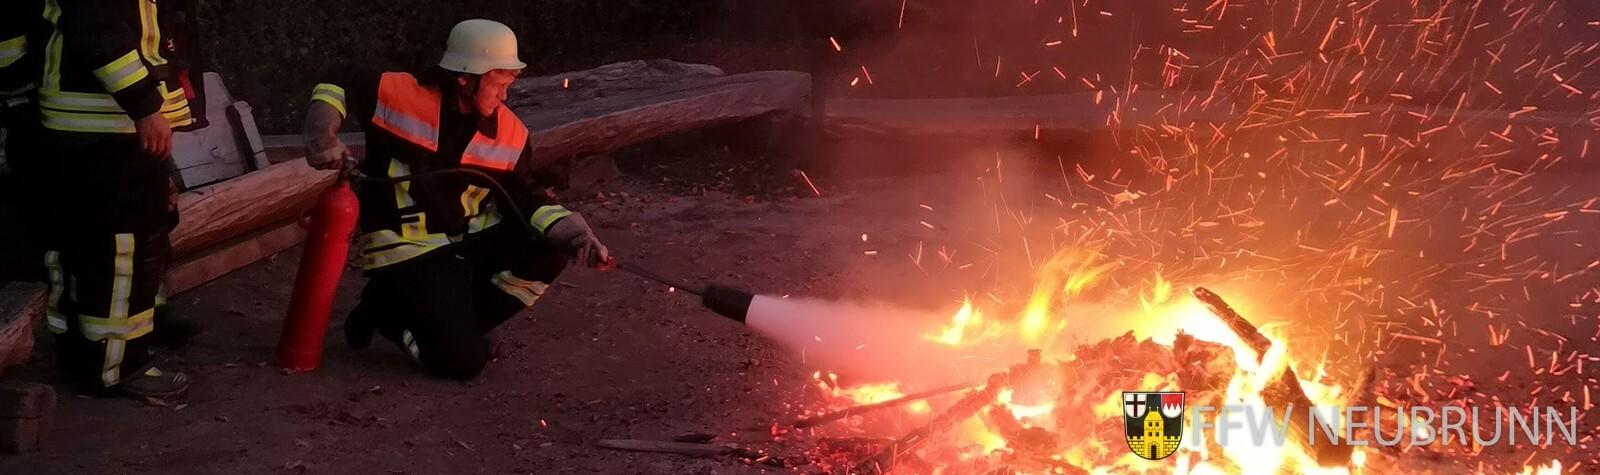 Jugendübung Feuerlöscher